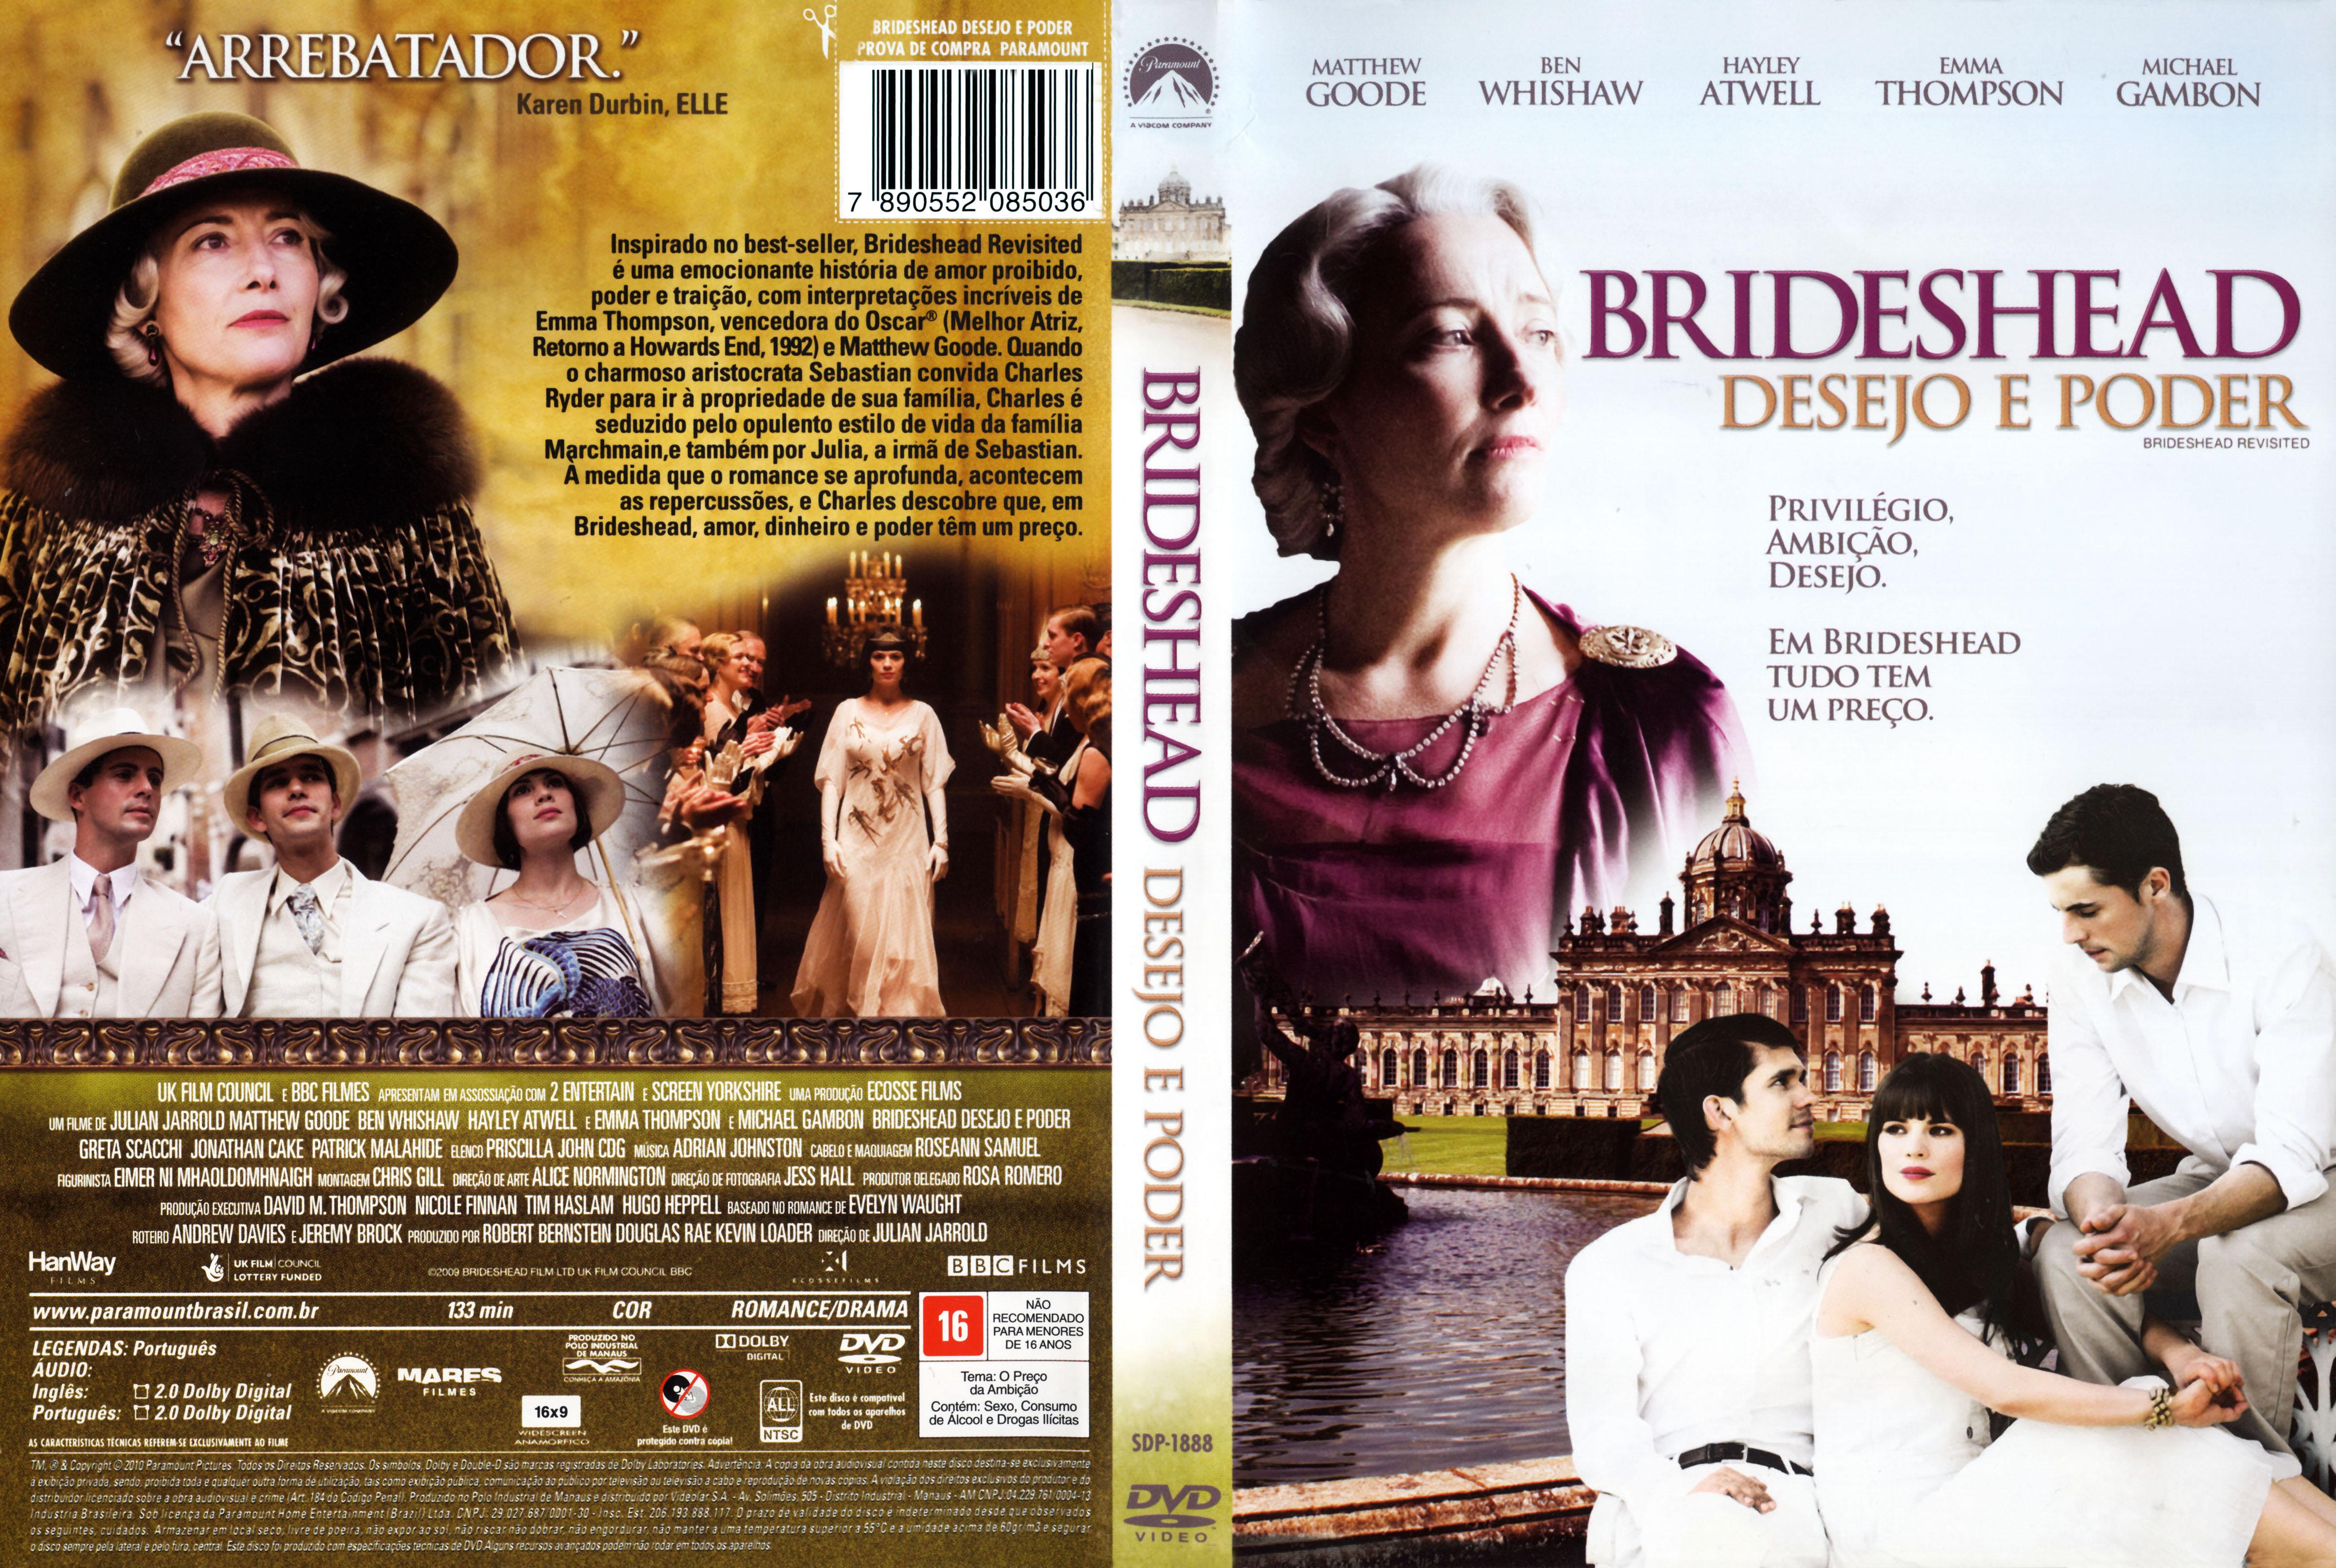 BridesheadDesejoePoder